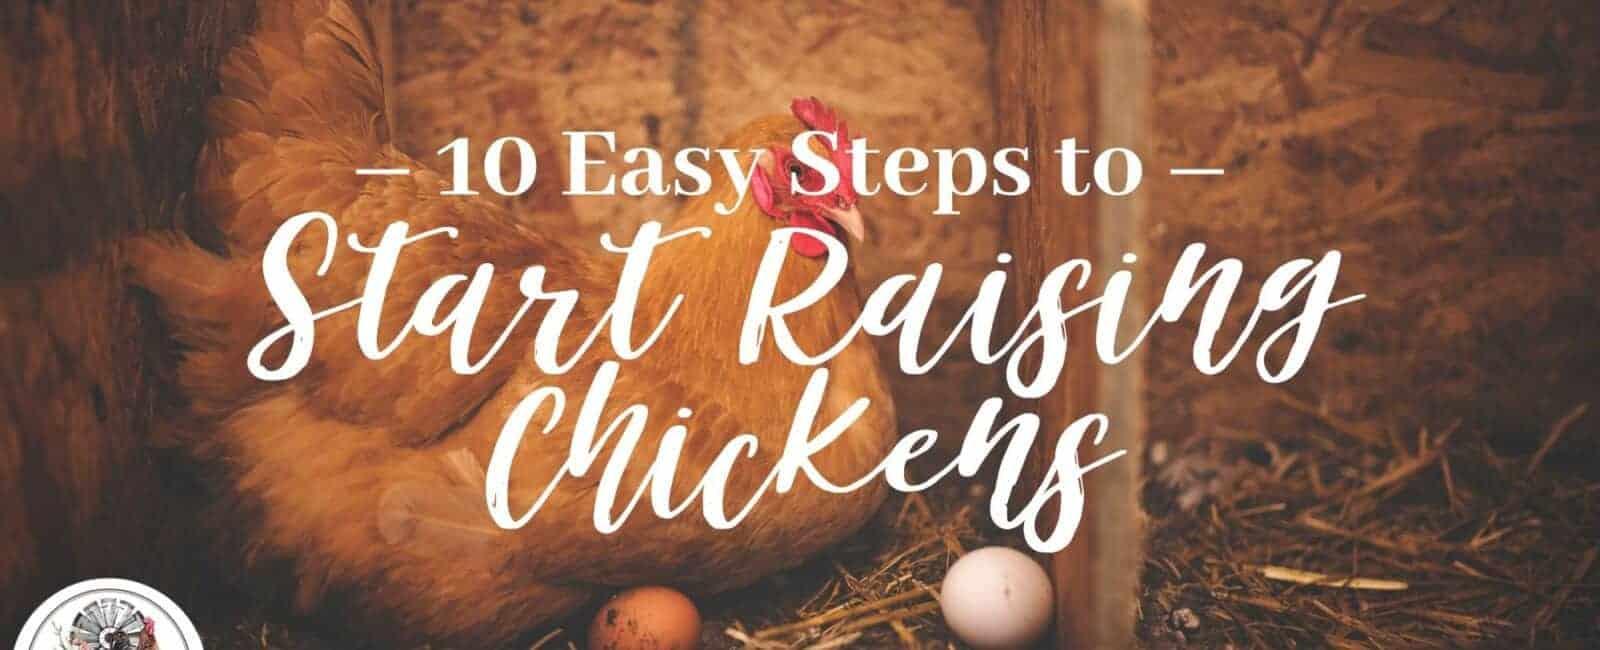 10 Easy Steps to Start Raising Chickens